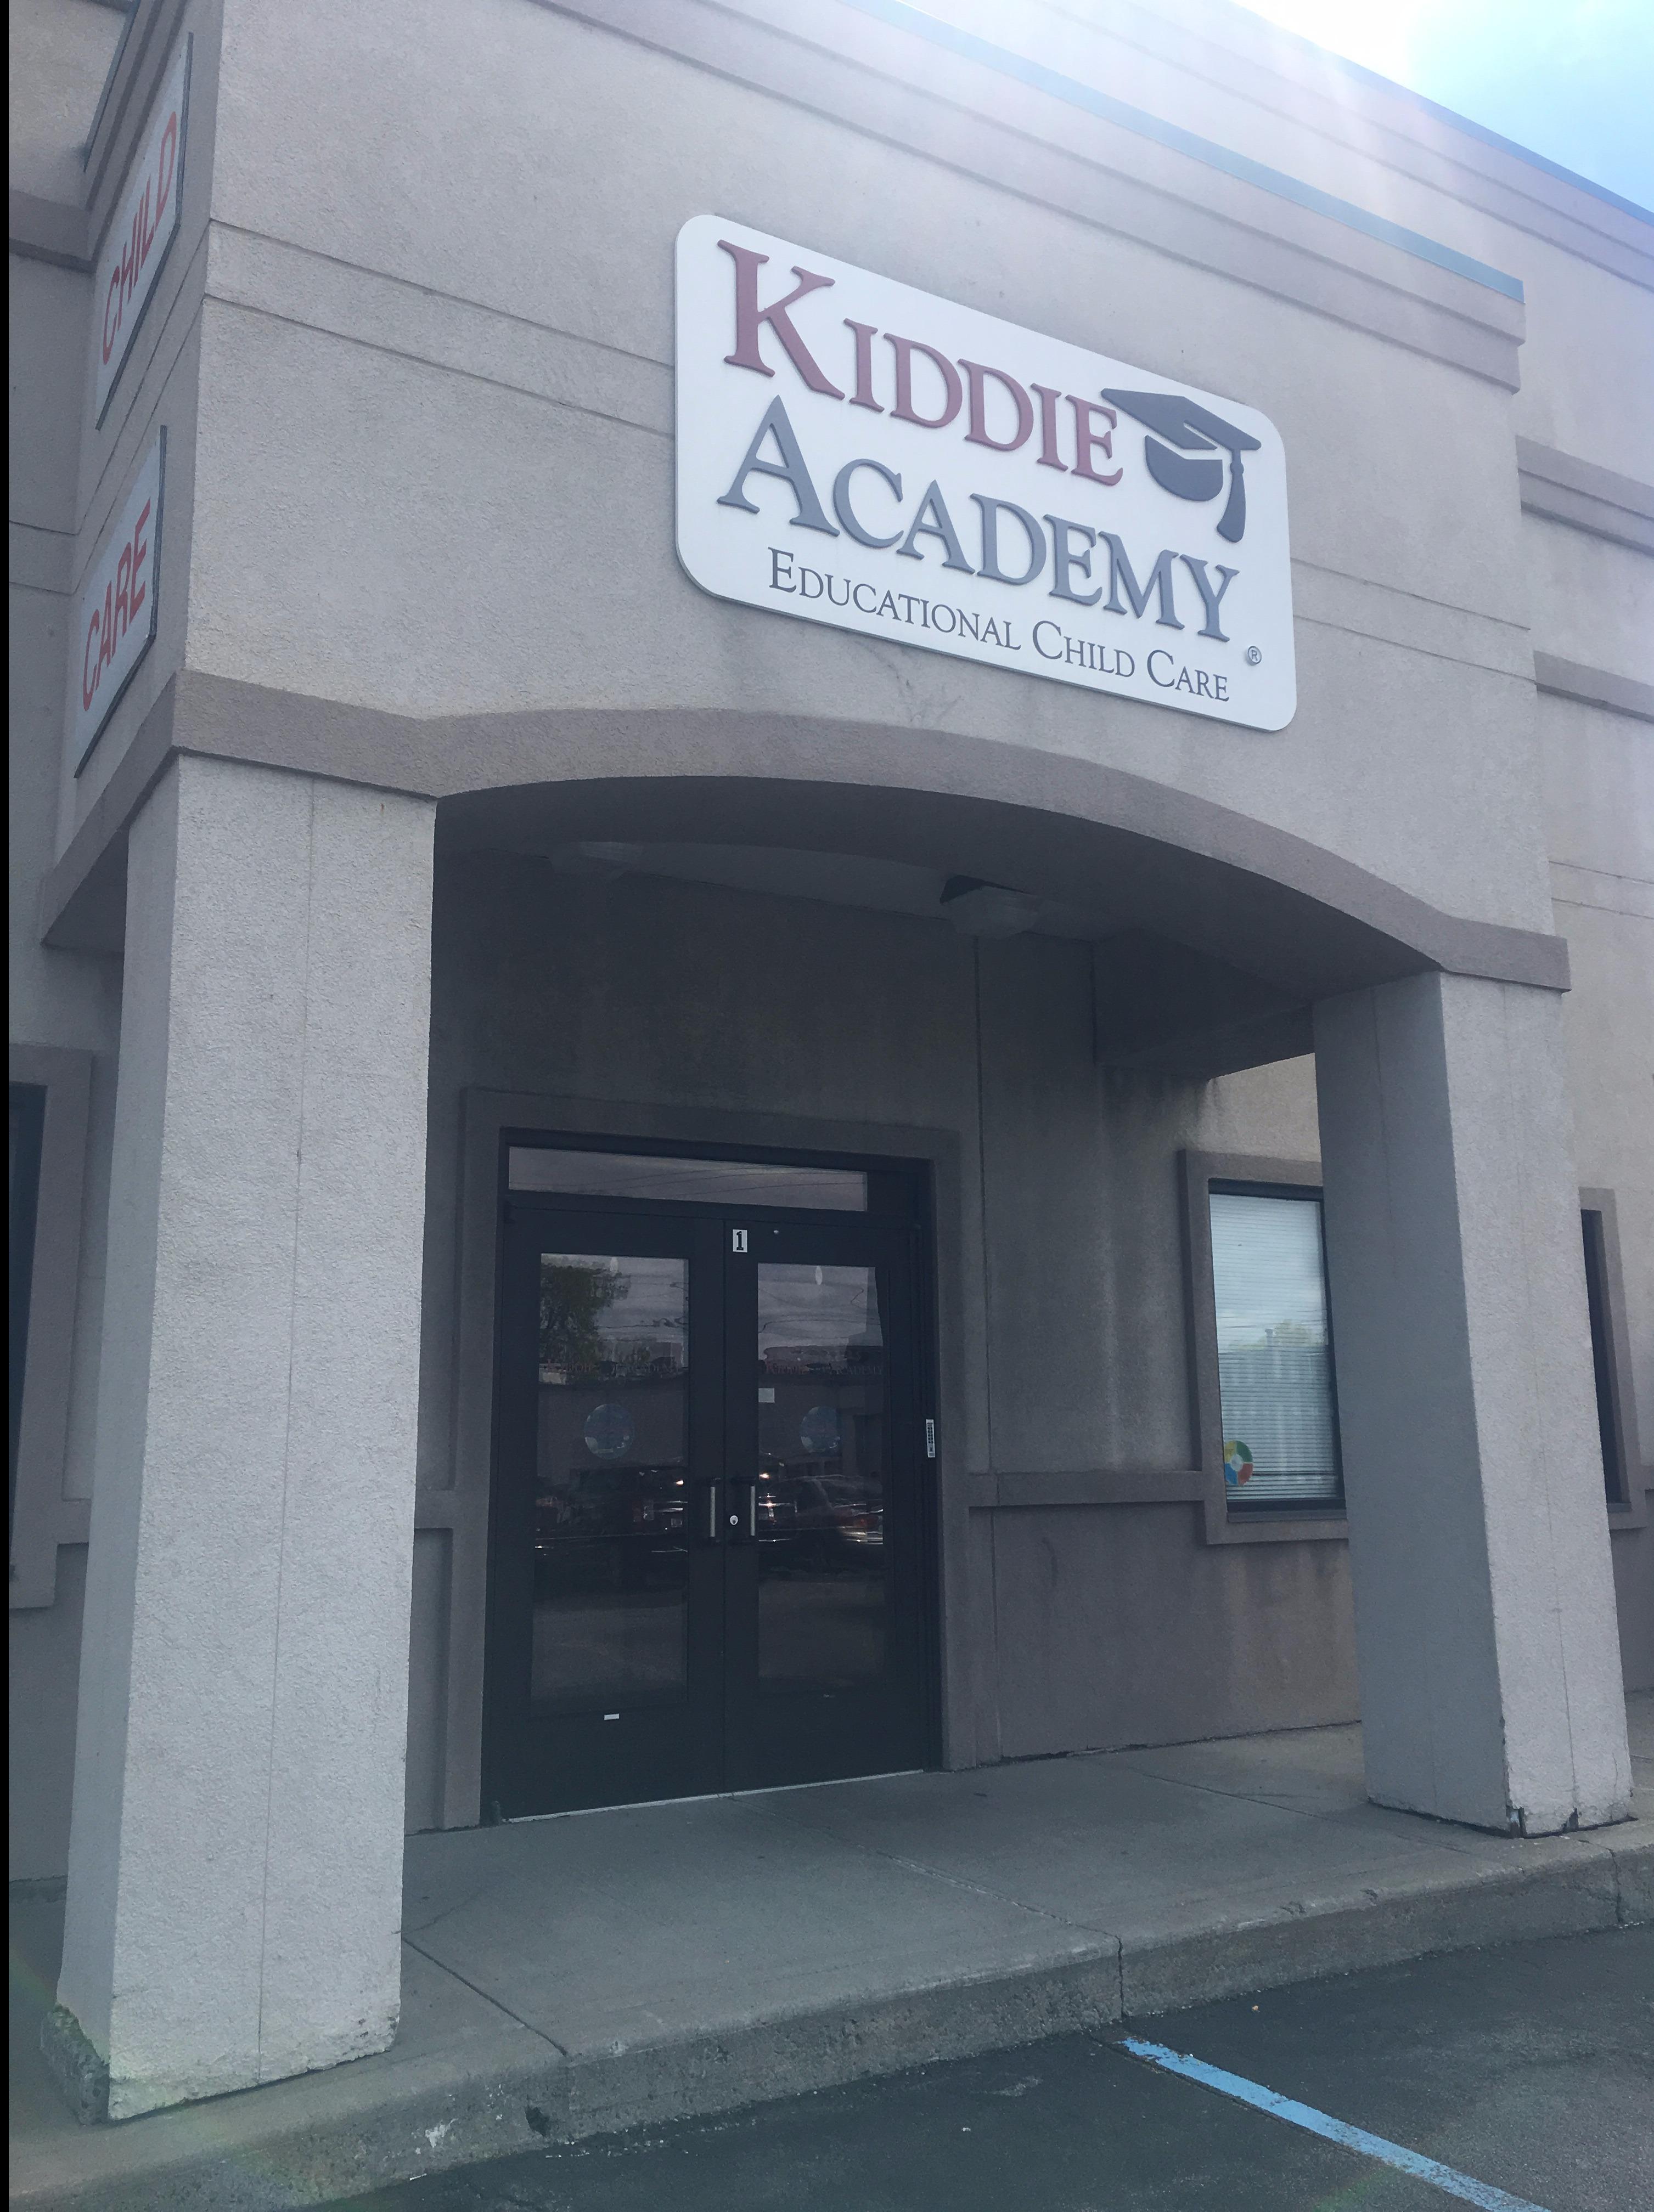 Kiddie Academy of Latham image 12